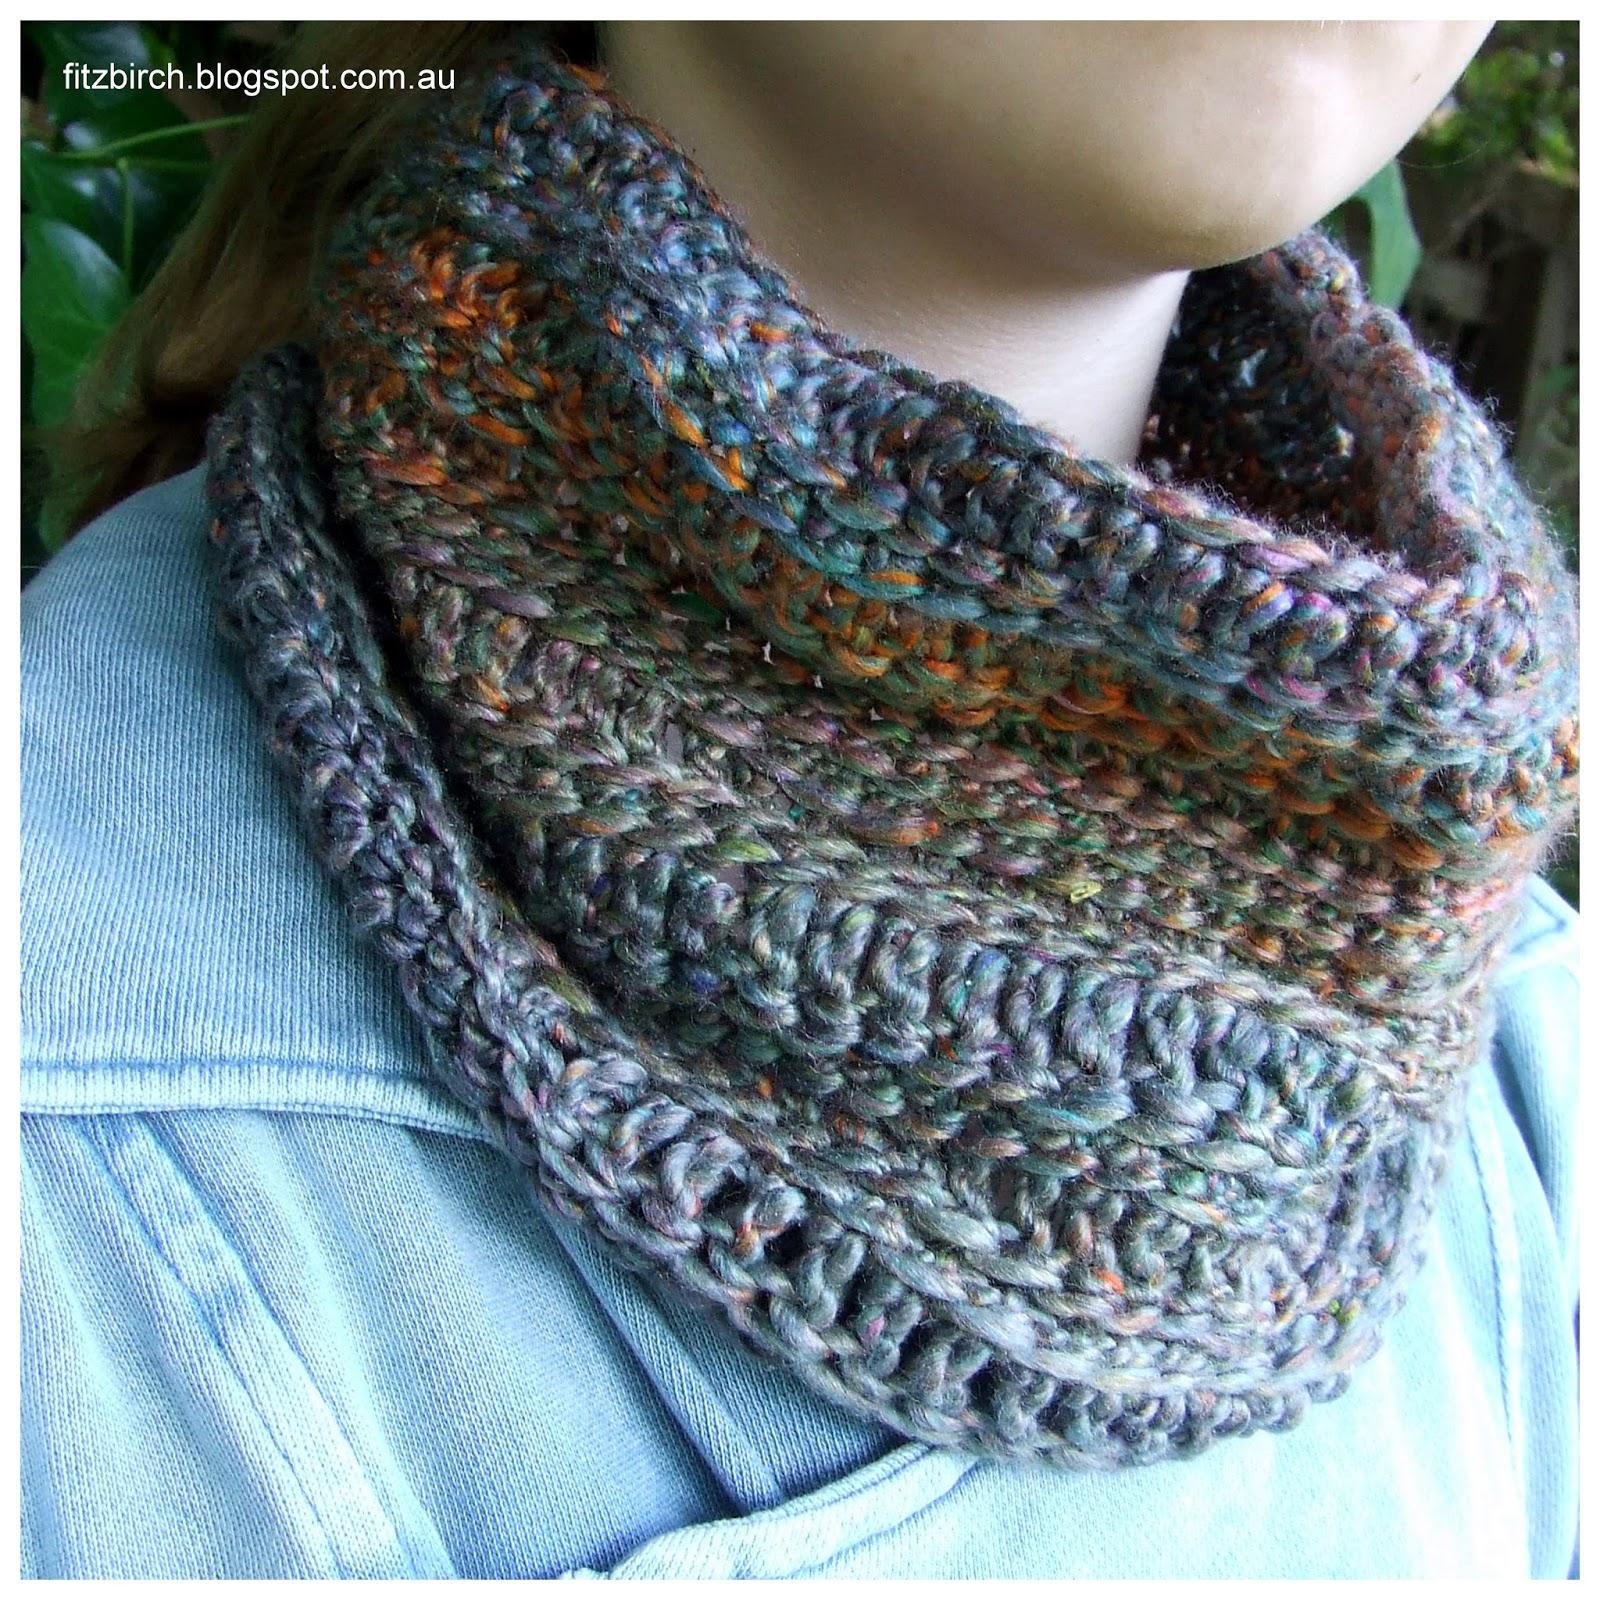 Fitzbirch Crafts Sari Silk Crochet Cowl